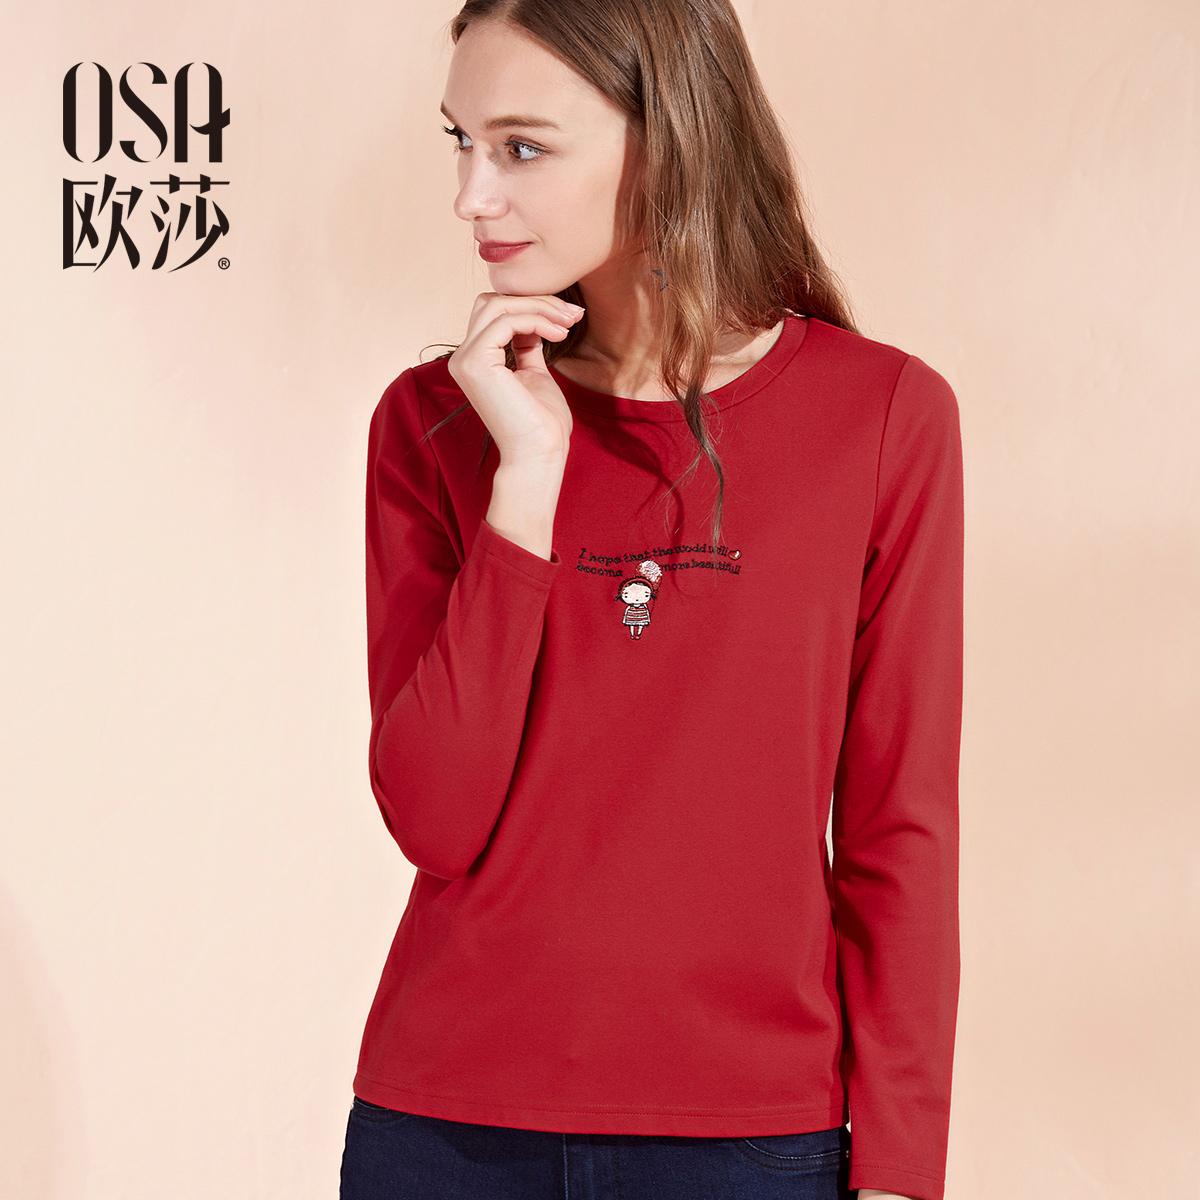 ⑩OSA欧莎童装2016秋装新款 条纹可爱图案女童T恤S316C11008